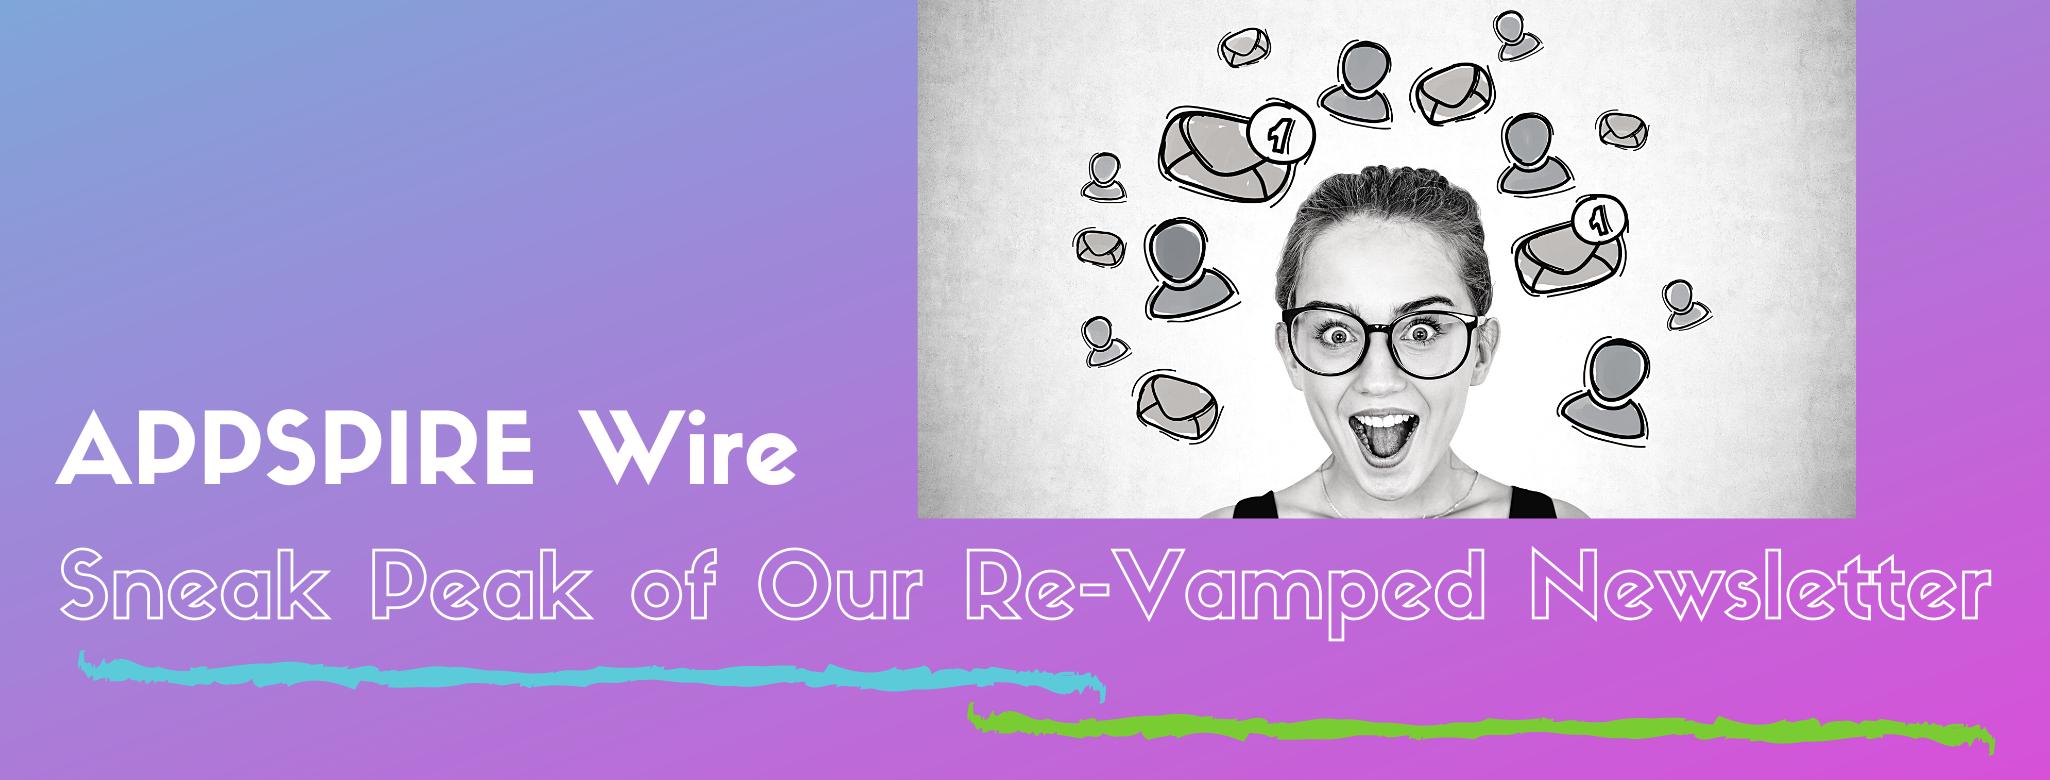 APPSPIRE Wire – Sneak Peak of Our Re-Vamped Newsletter